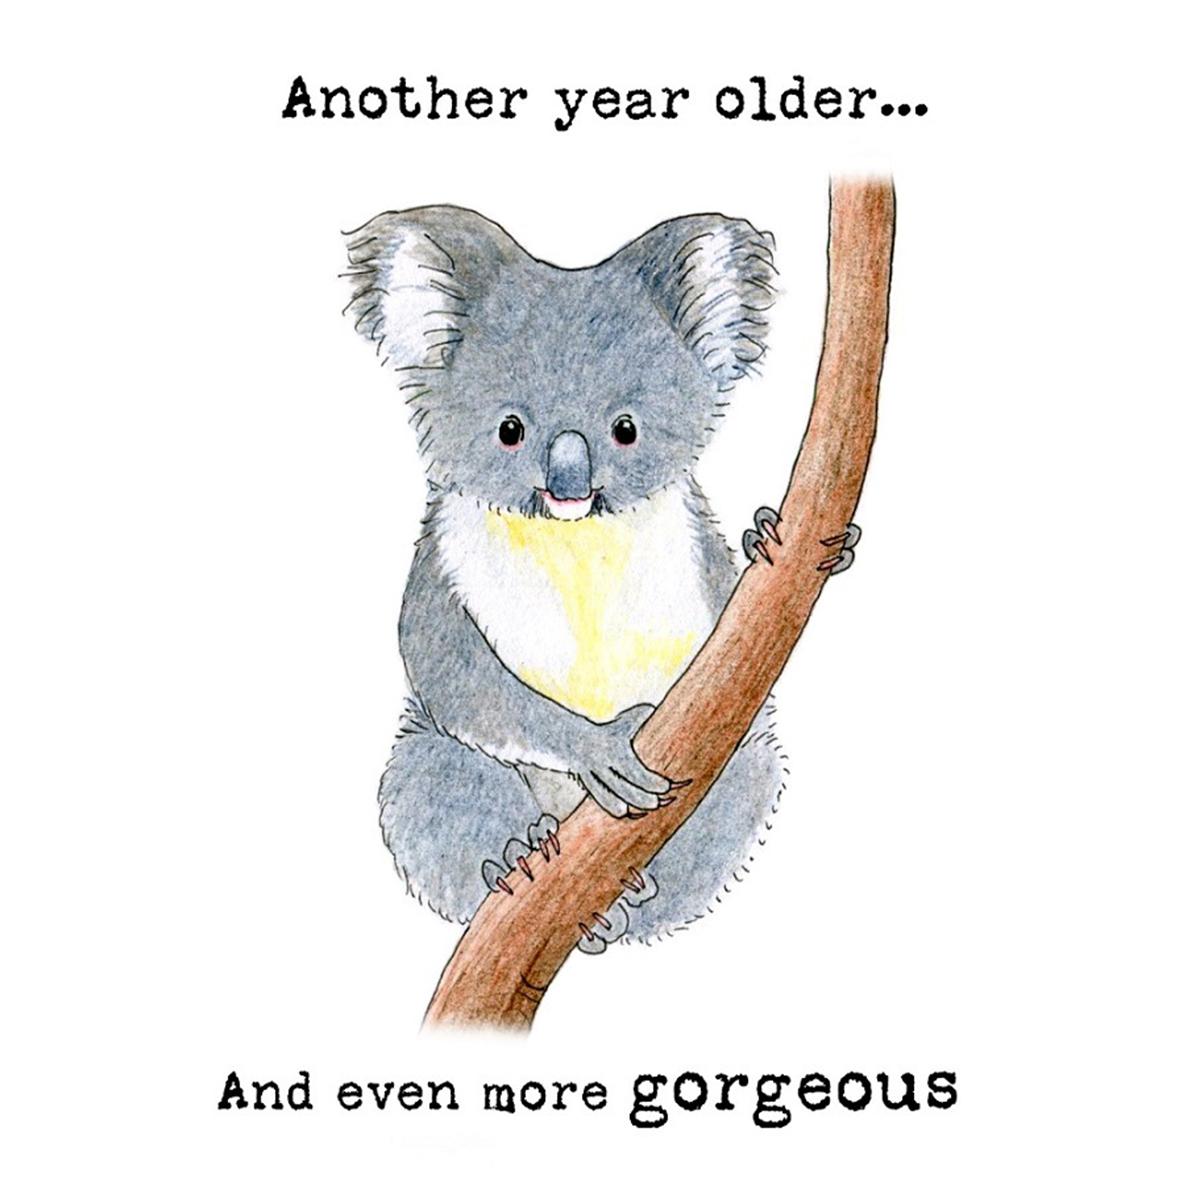 Two new koala birthday cards